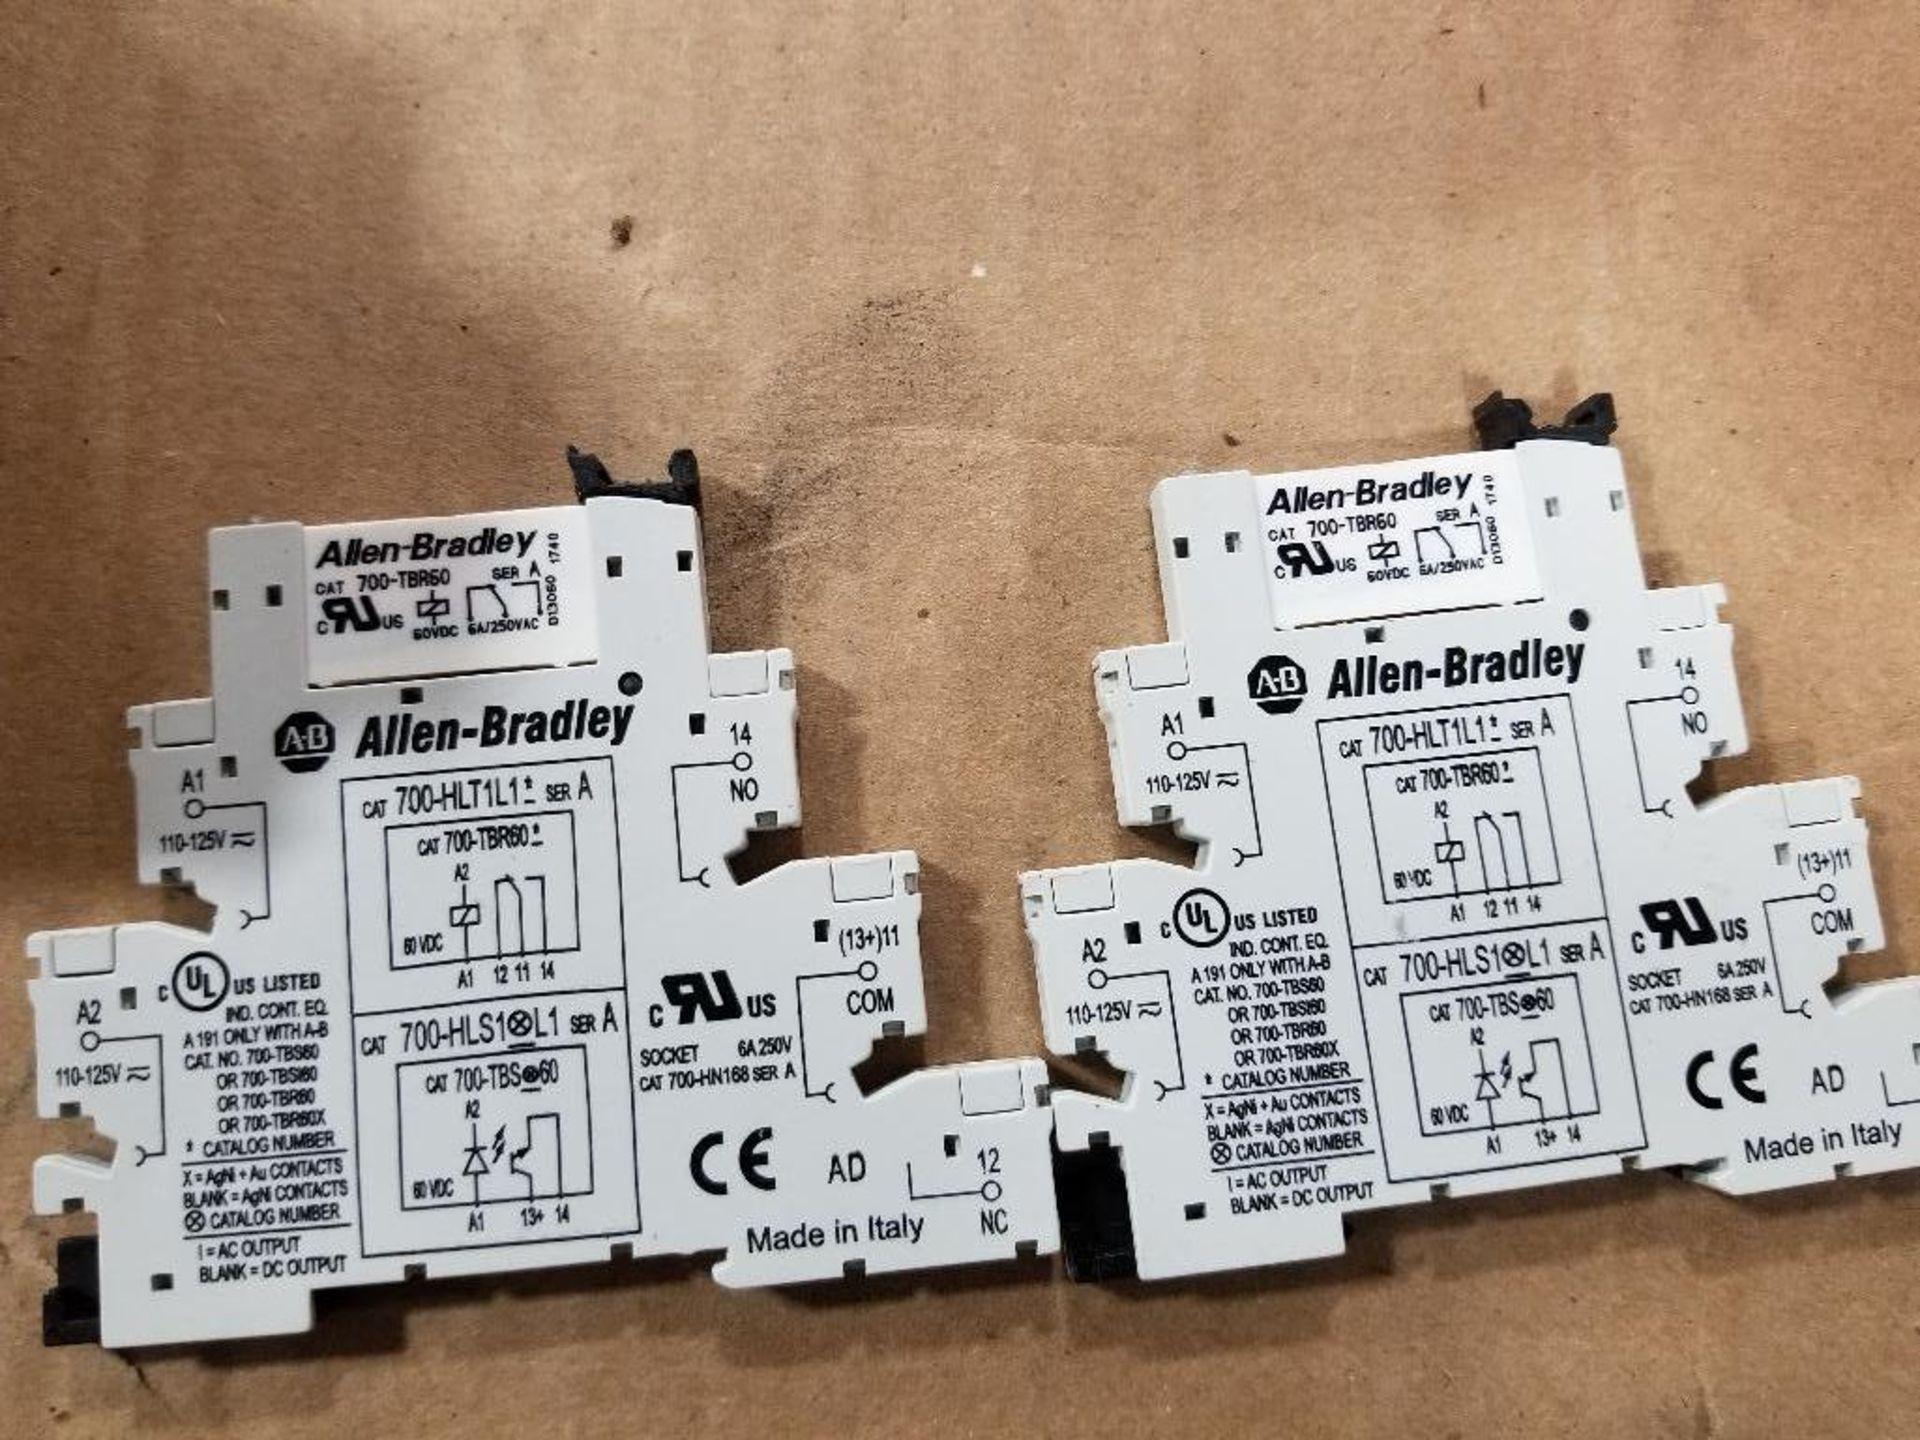 Assorted electrical. Allen Bradley, ADDA, Dayton, Sunon, Legrand. - Image 8 of 9